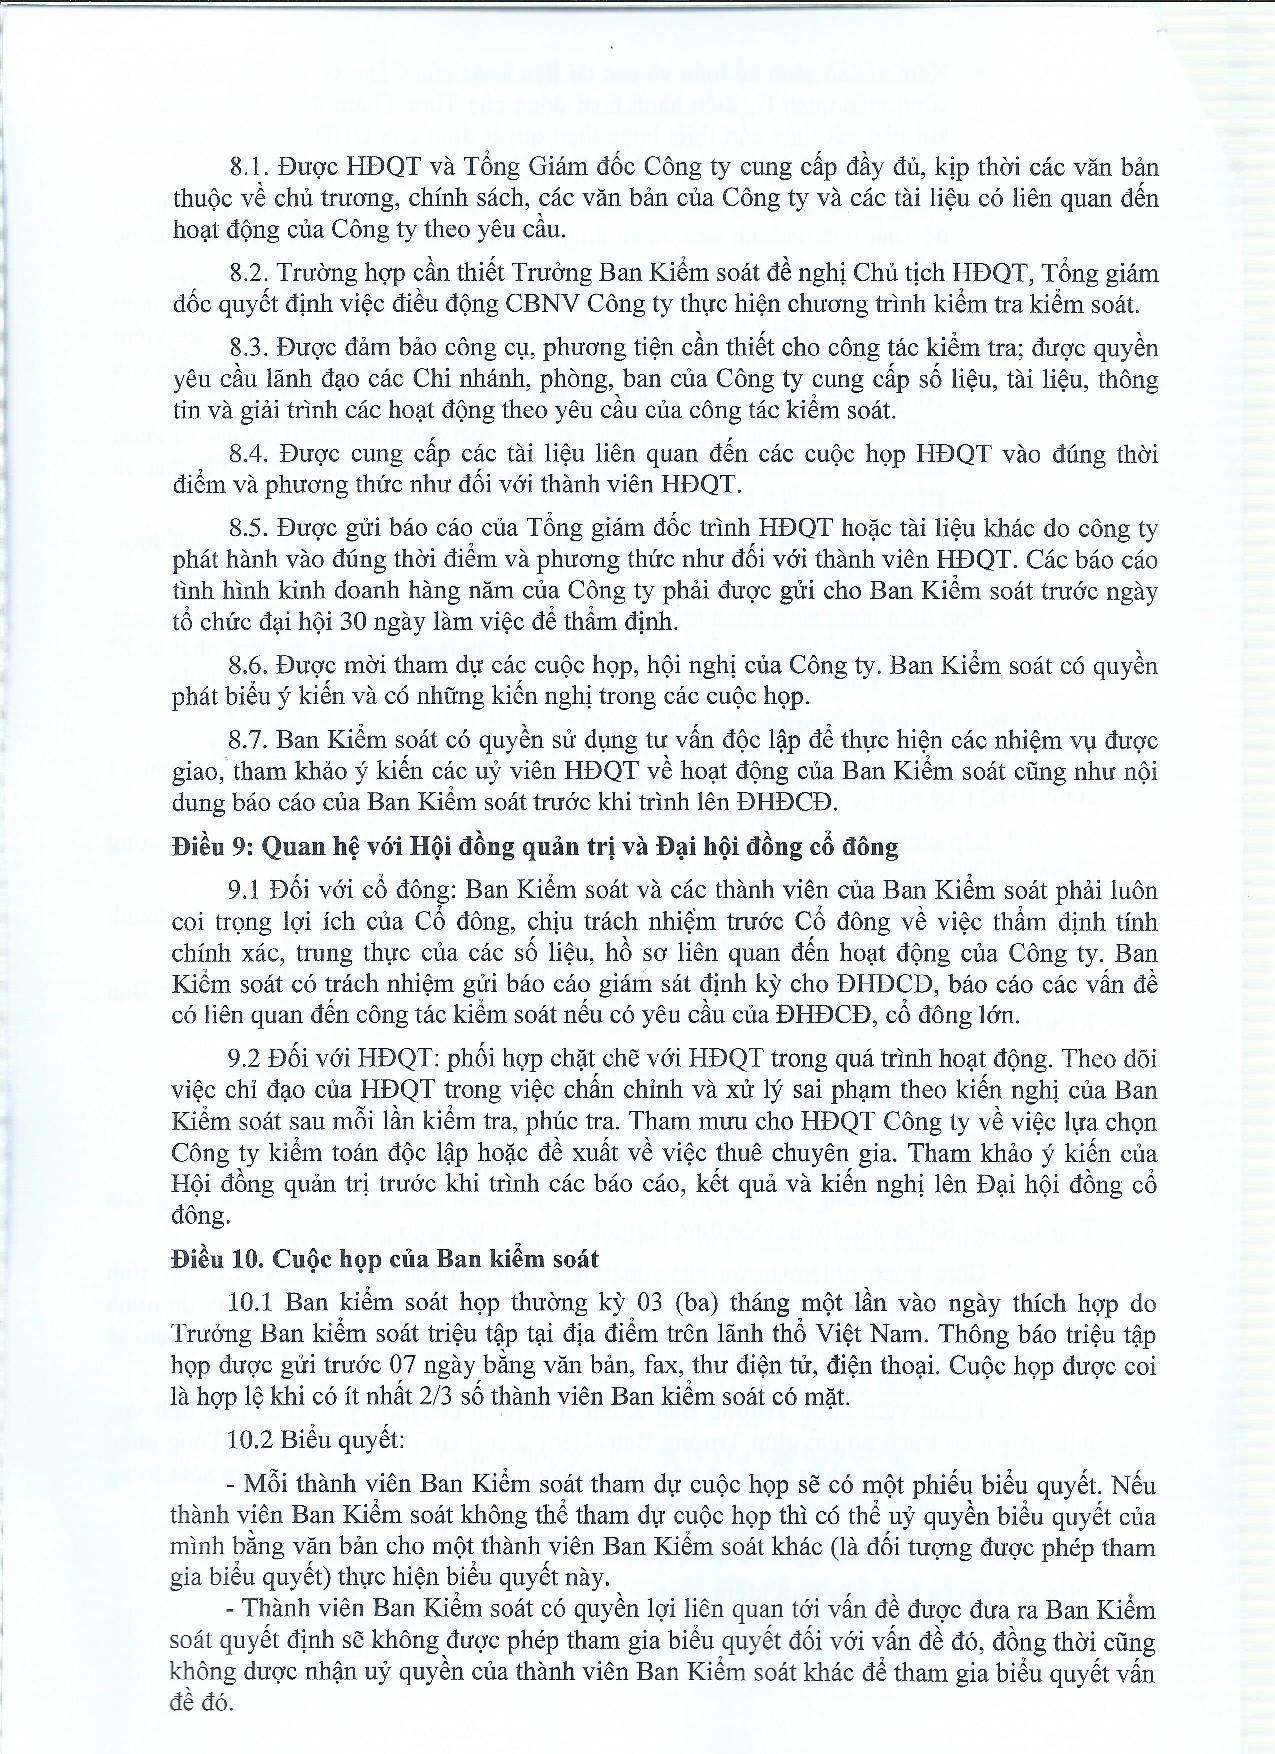 21320165_qui-che-hdong-cua-BKS-page-004